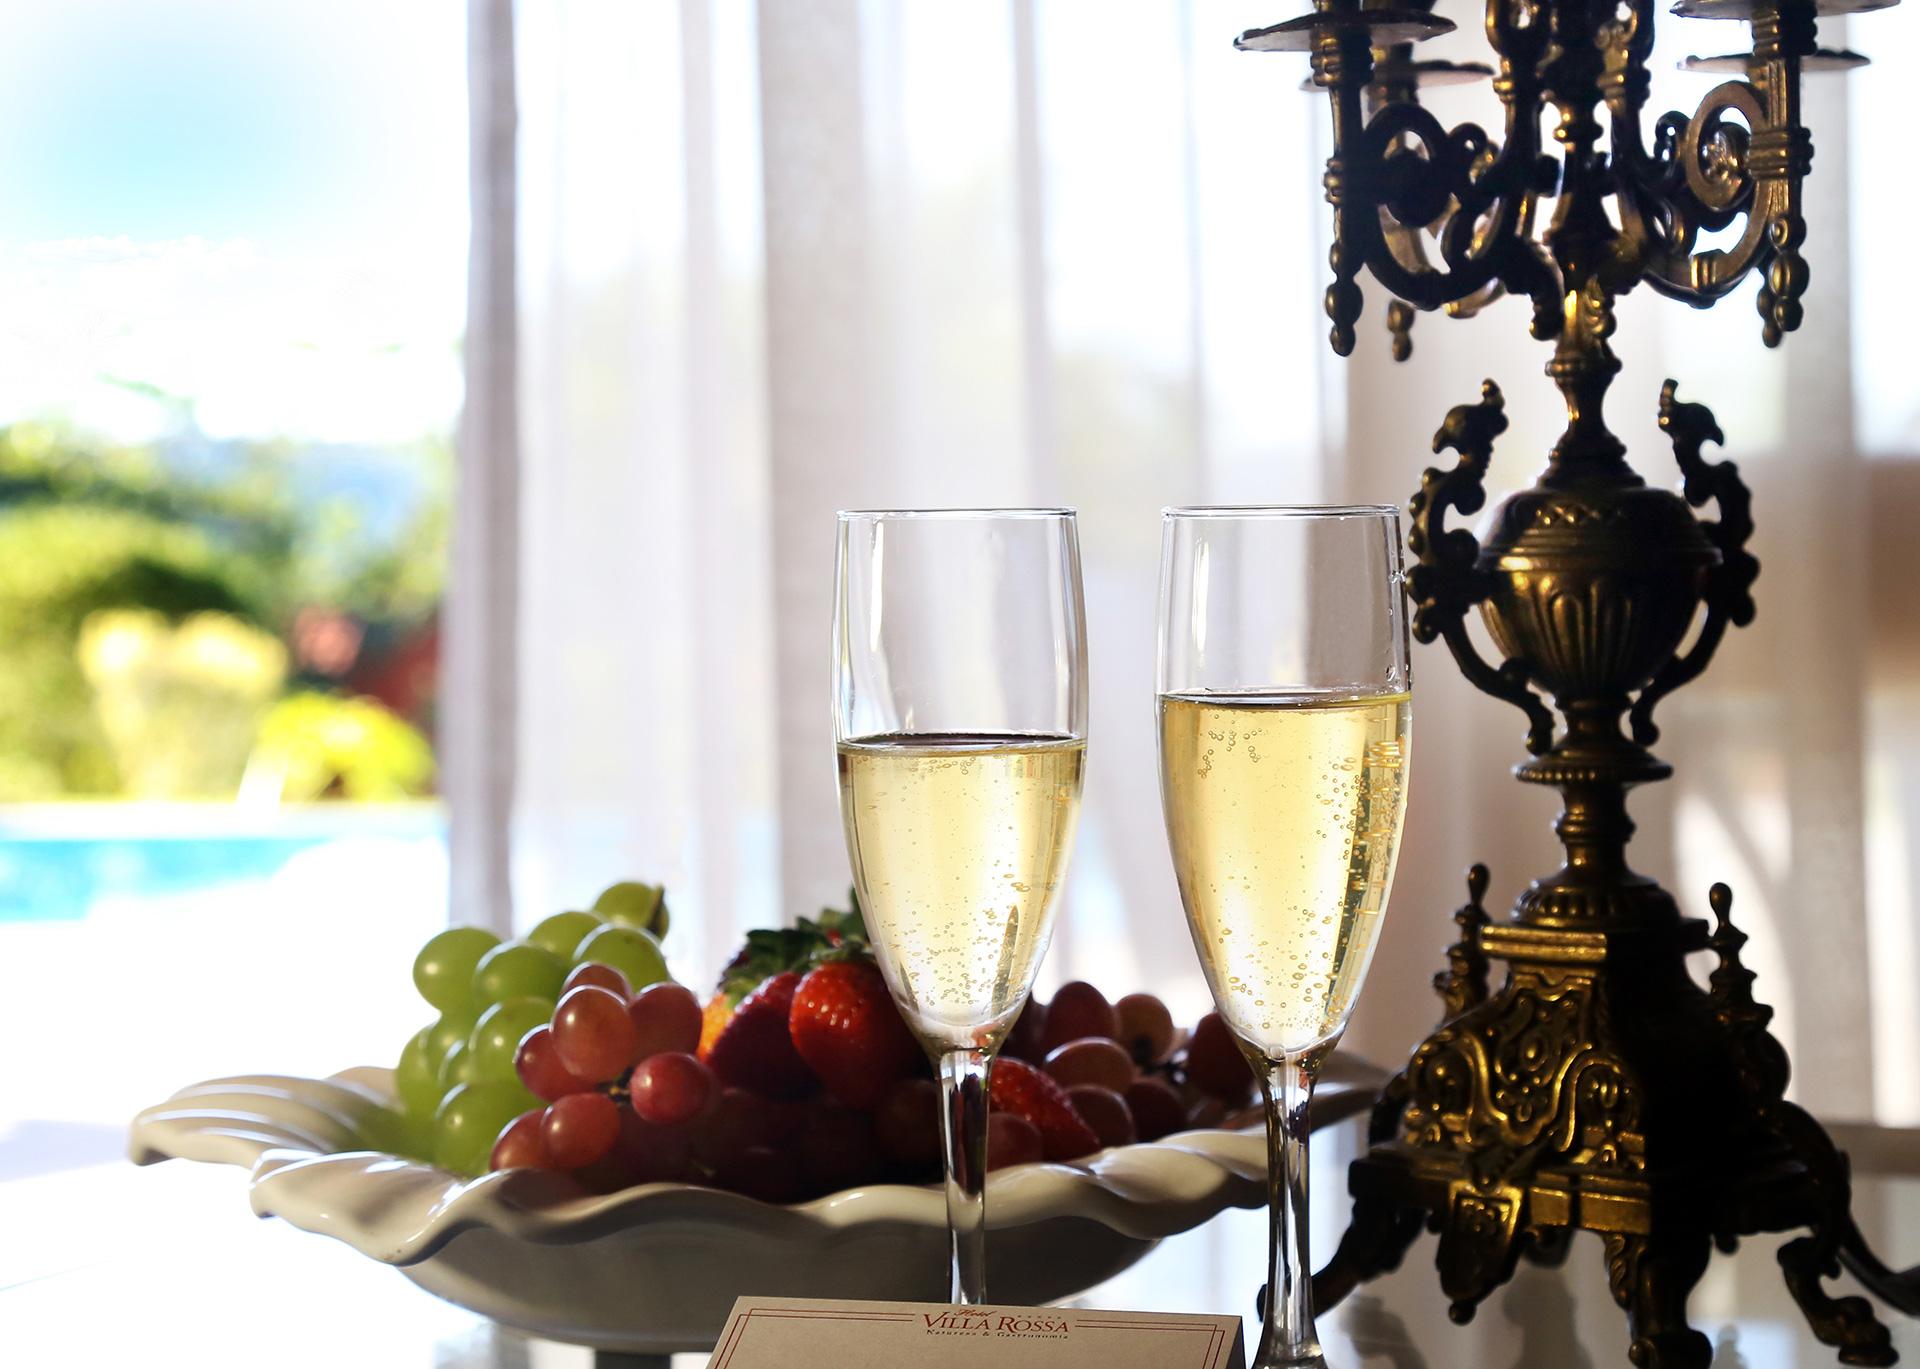 IMG_Hotel-Villa-Rossa-Sinfonia-das-Flores-Juba-Alves-Fotografia-sr-sp-128